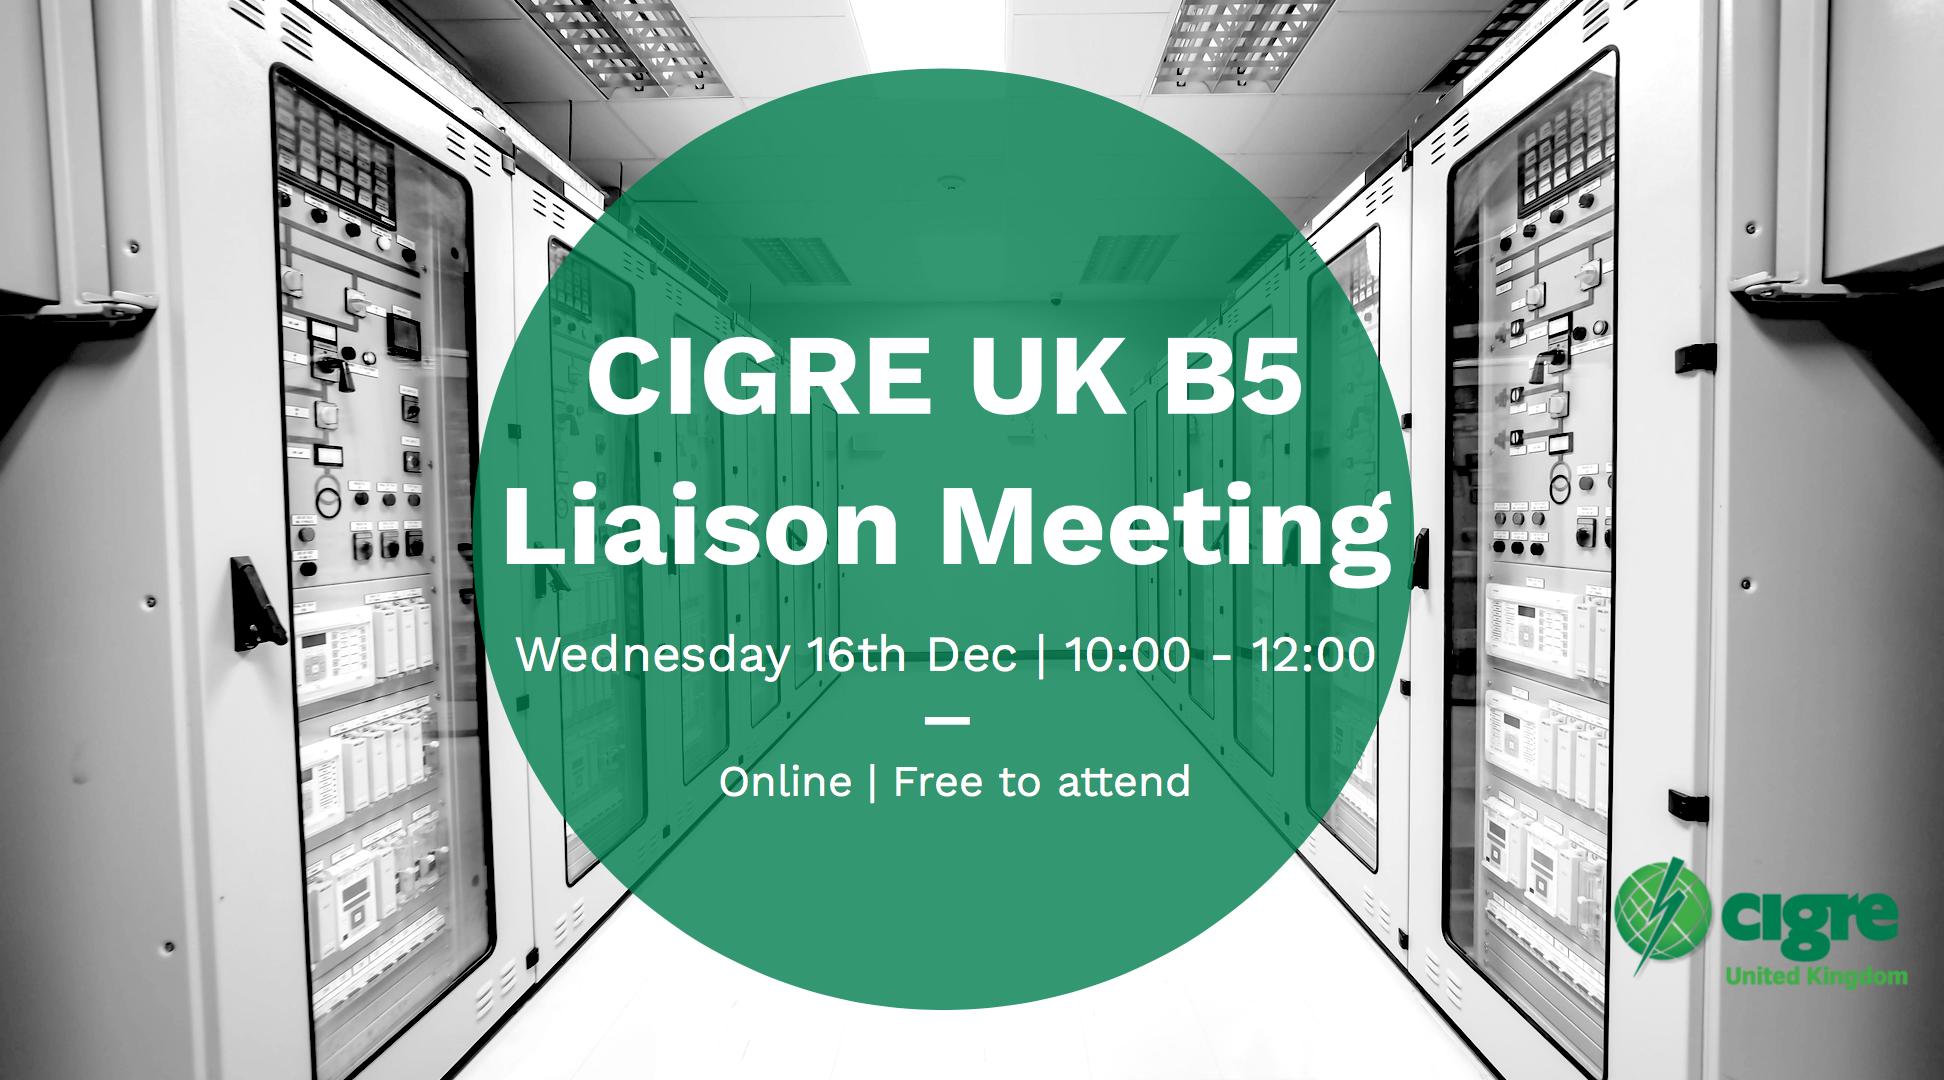 B5 Liaison Meeting eventbrite image